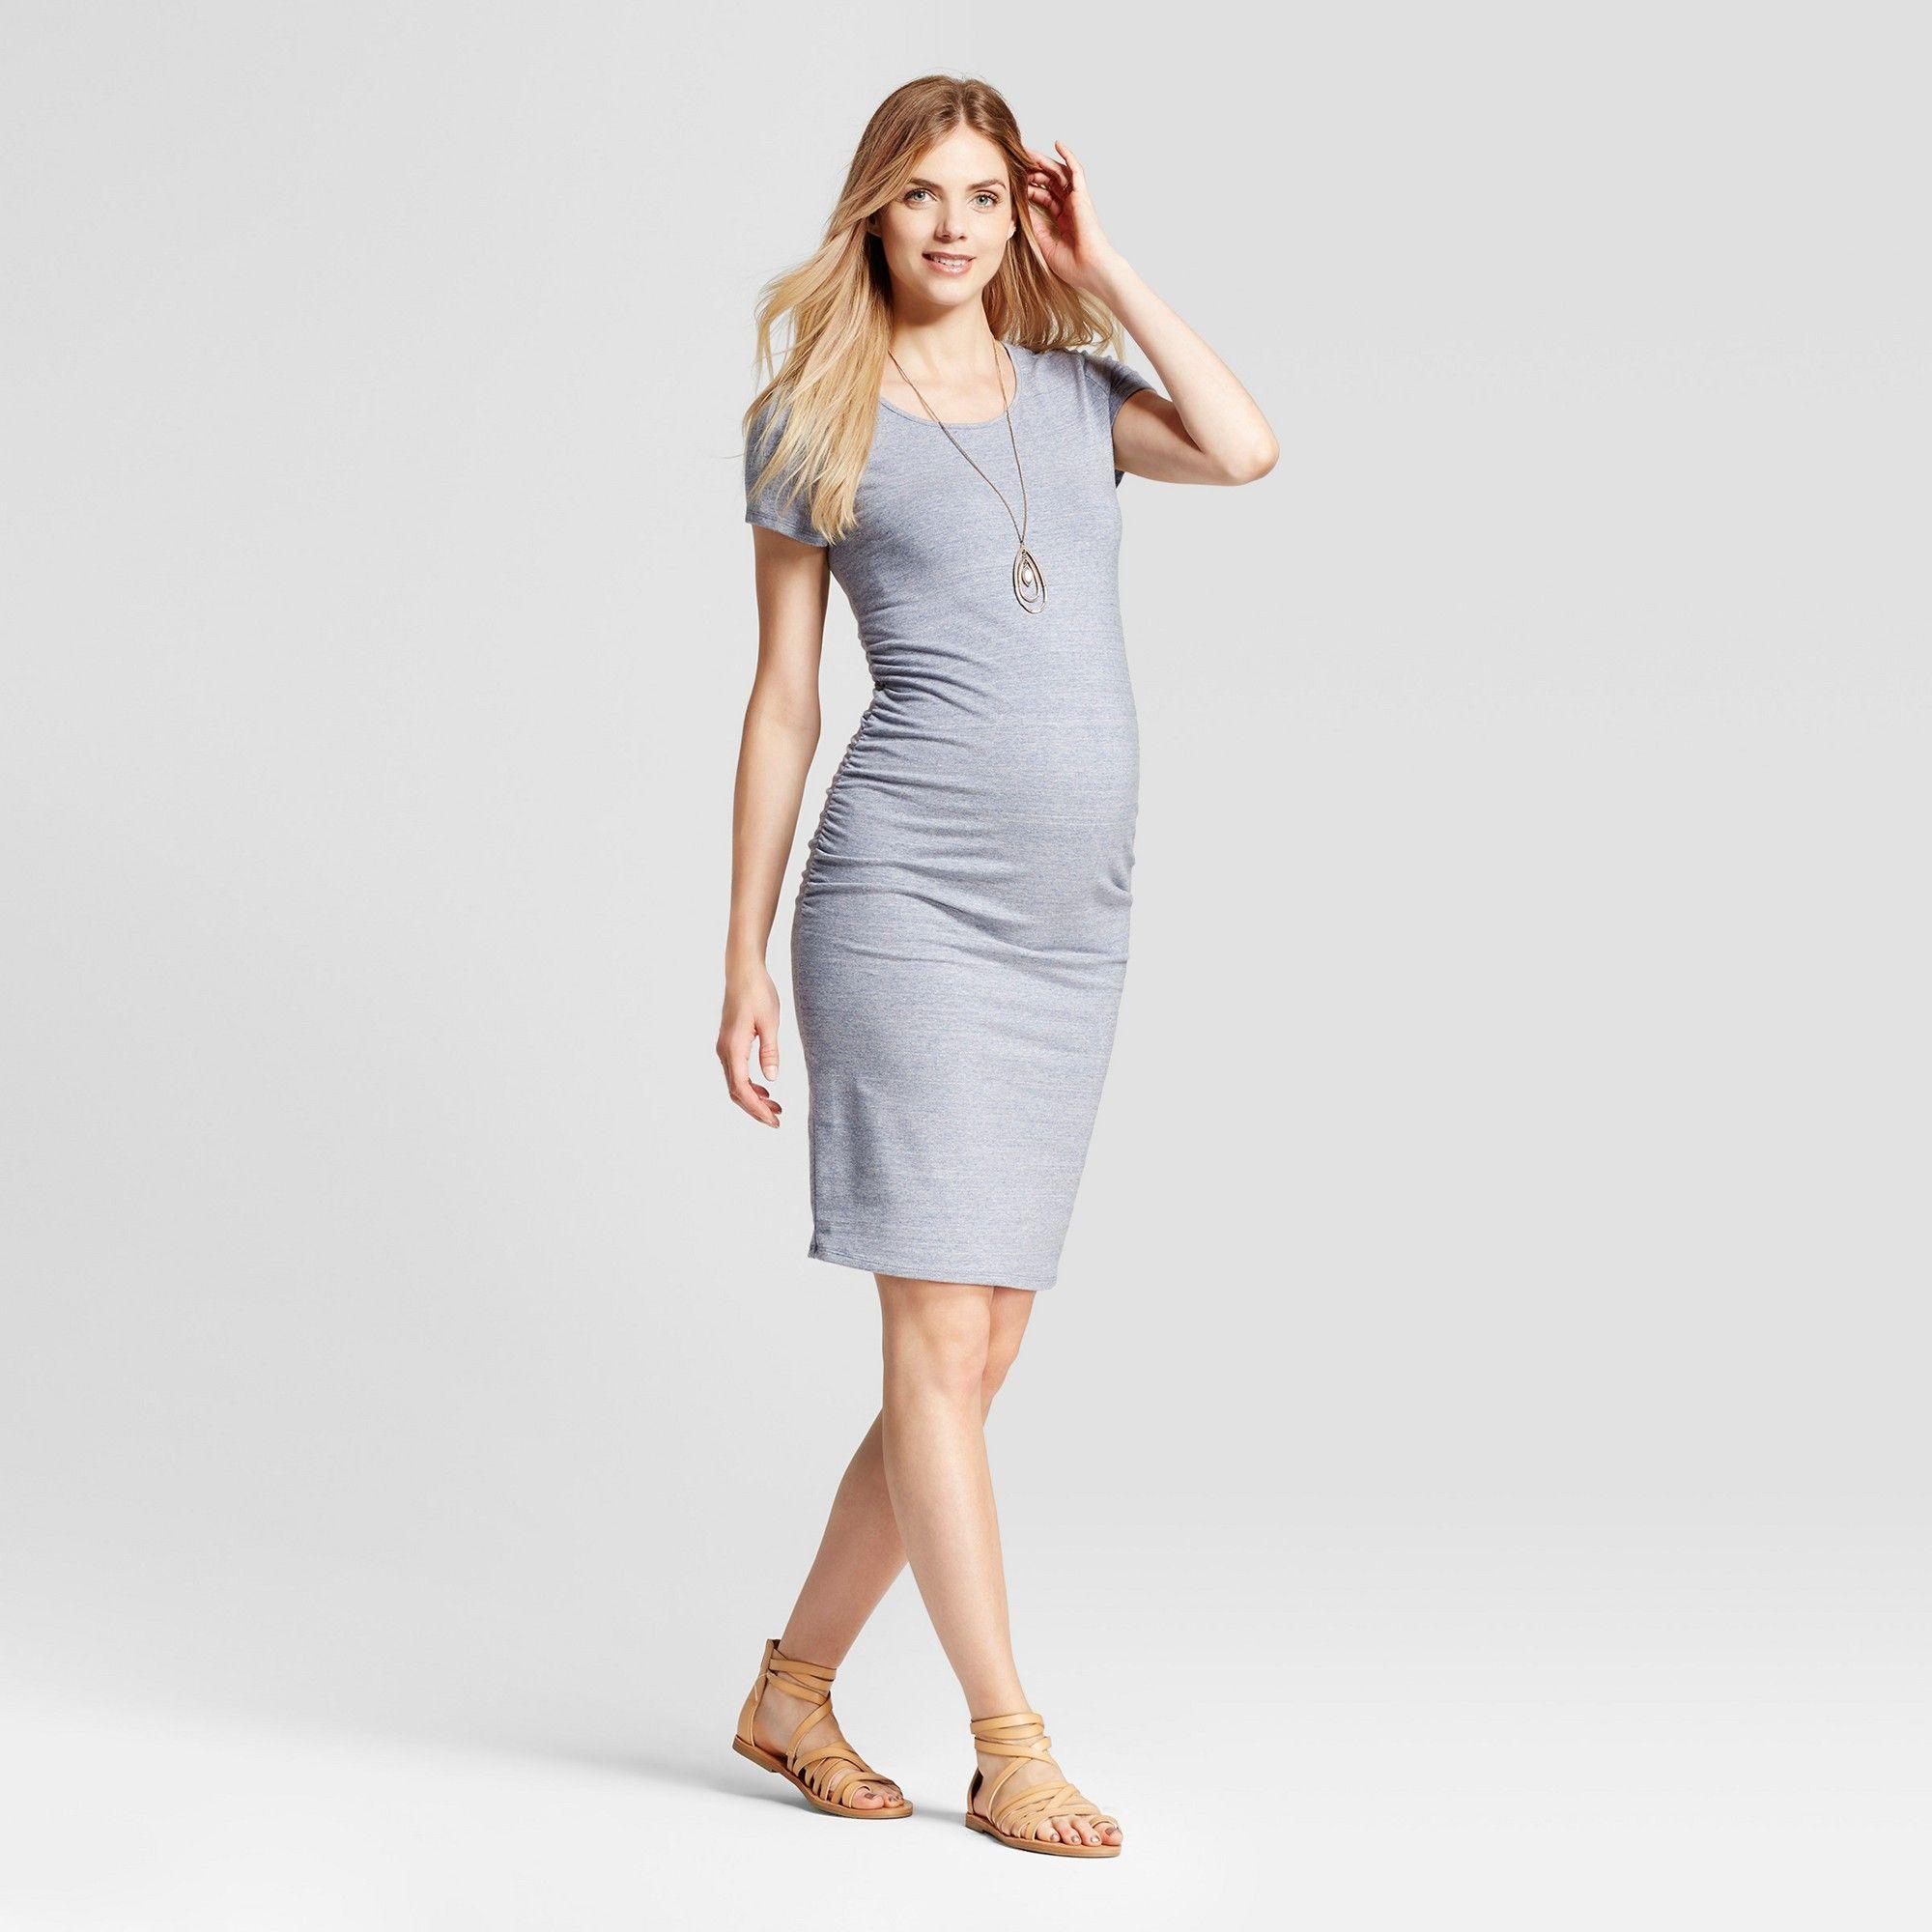 8287592b0f9f8 Maternity Short Sleeve Shirred T-Shirt Dress - Isabel Maternity by Ingrid &  Isabel Blue Marble Heather M, Women's